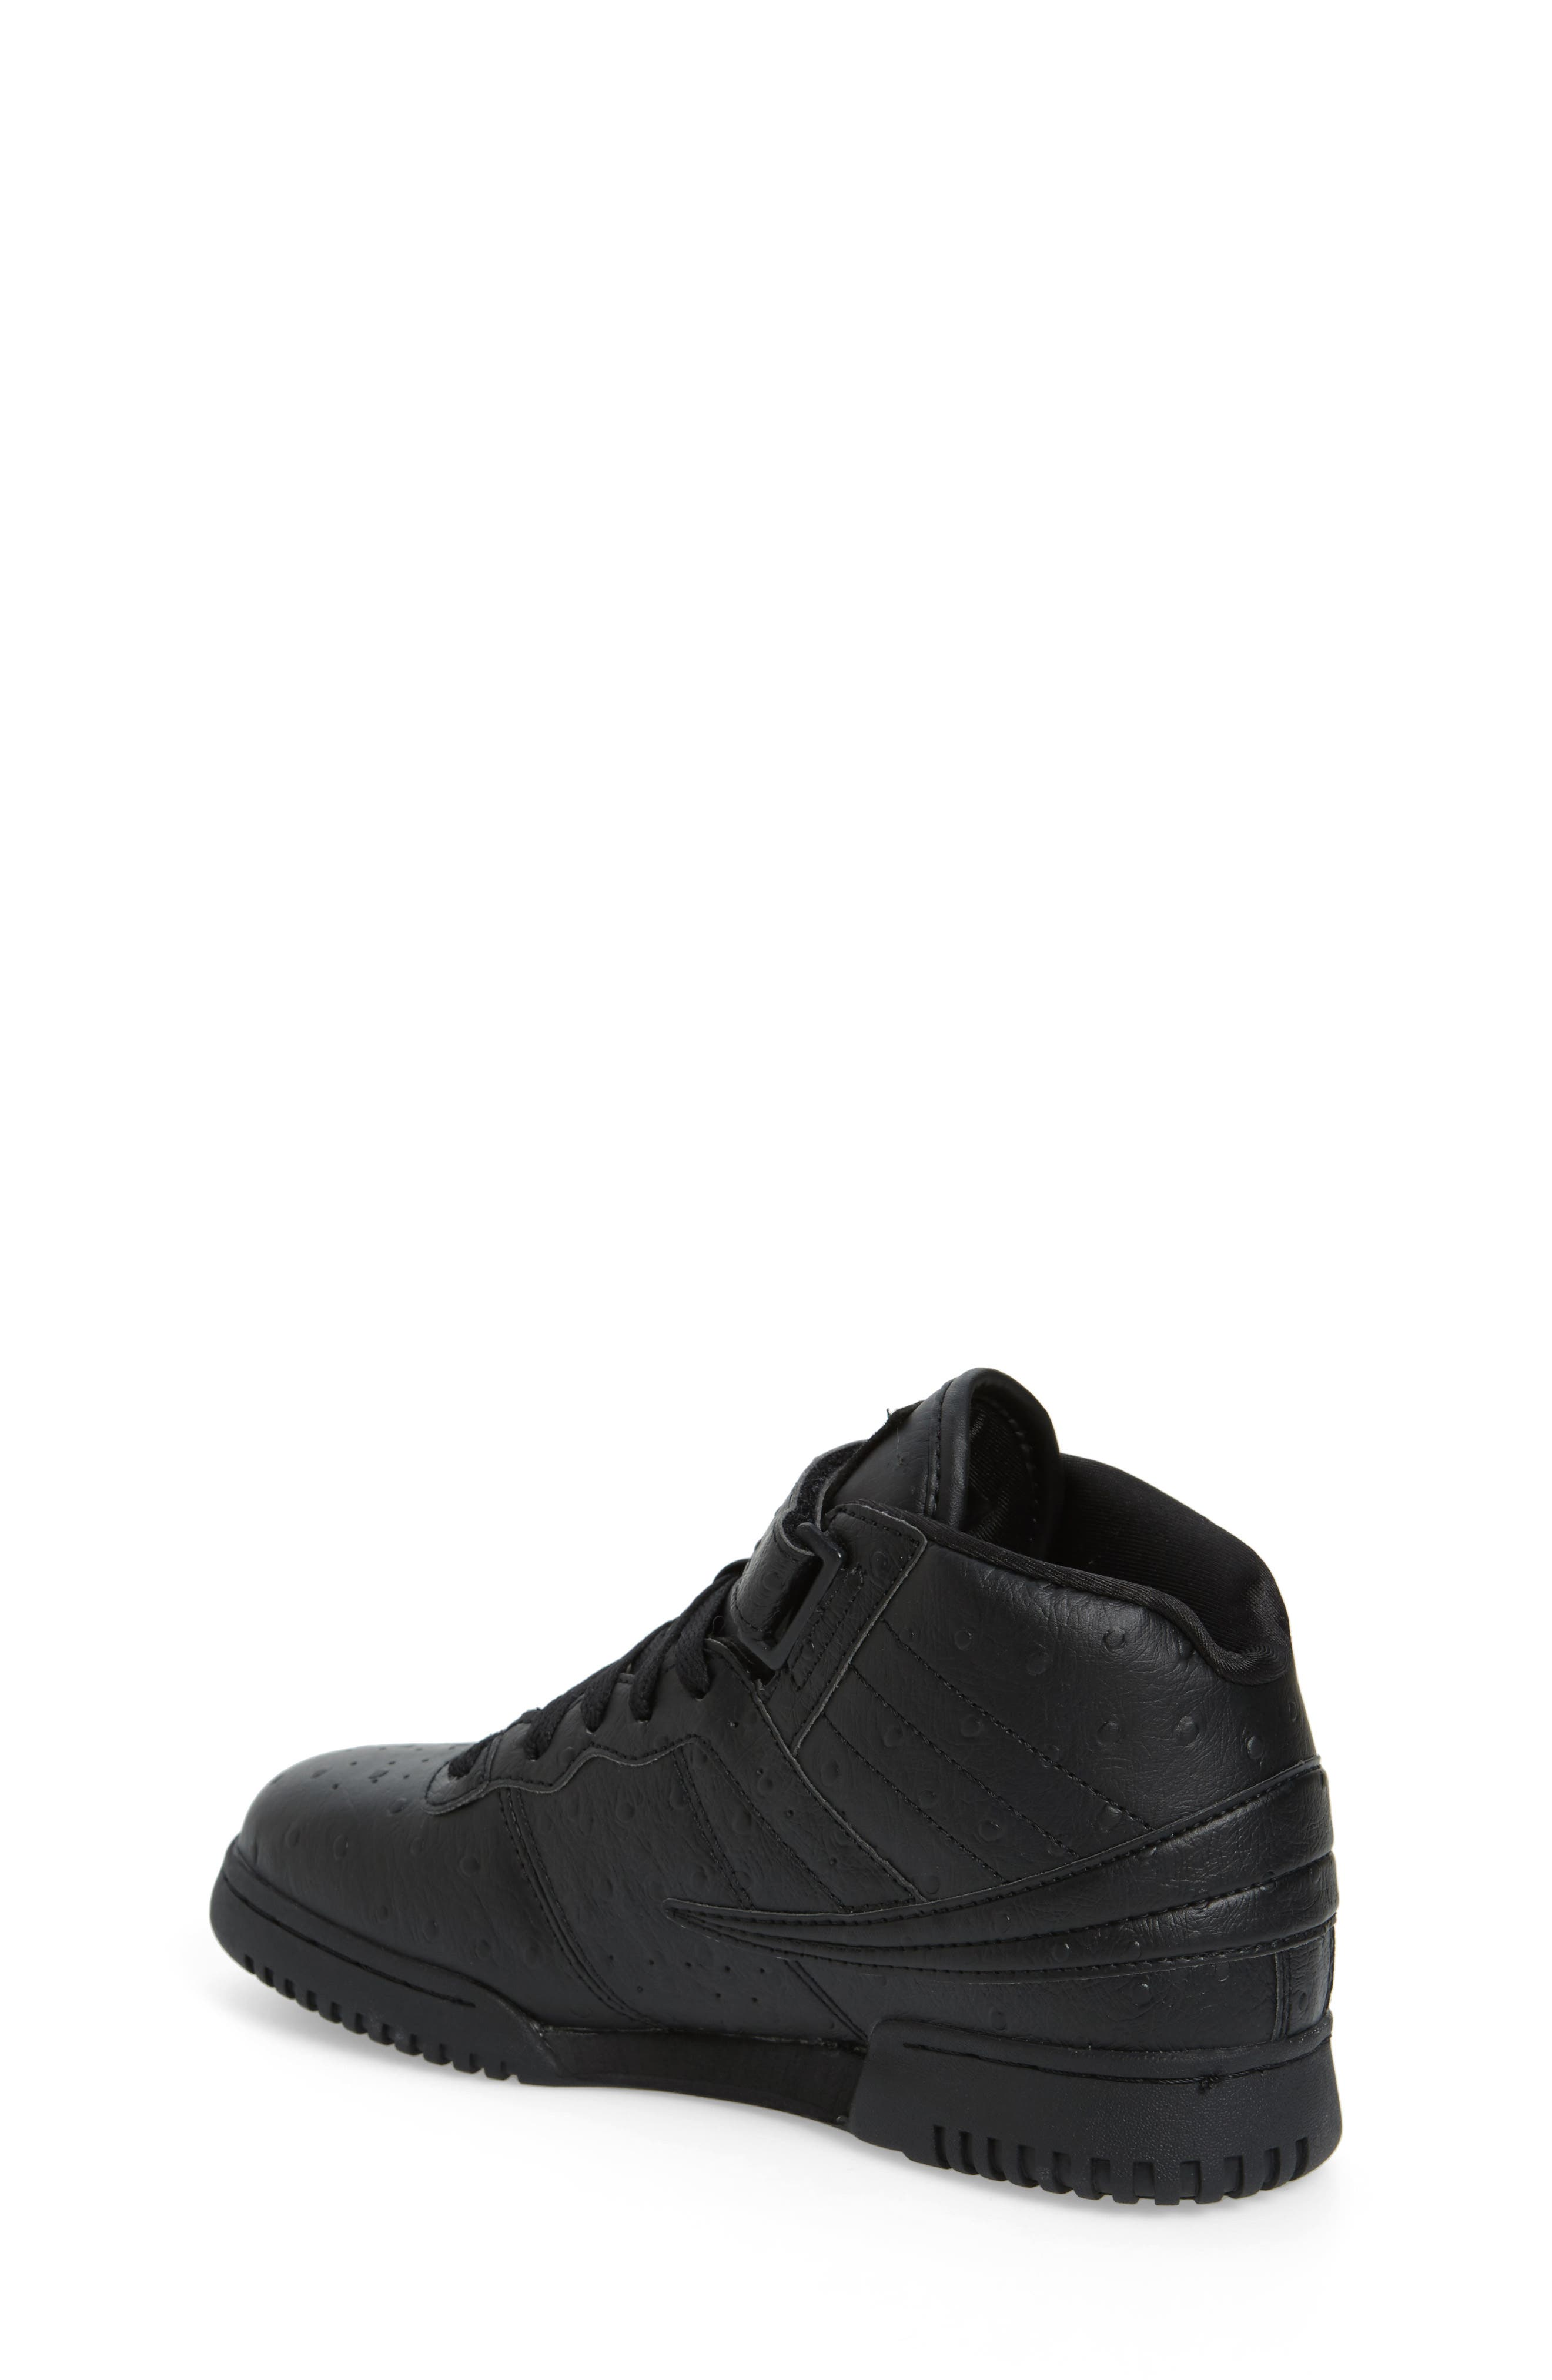 FILA, F-13 Ostrich Embossed High Top Sneaker, Alternate thumbnail 2, color, TRIPLE BLACK